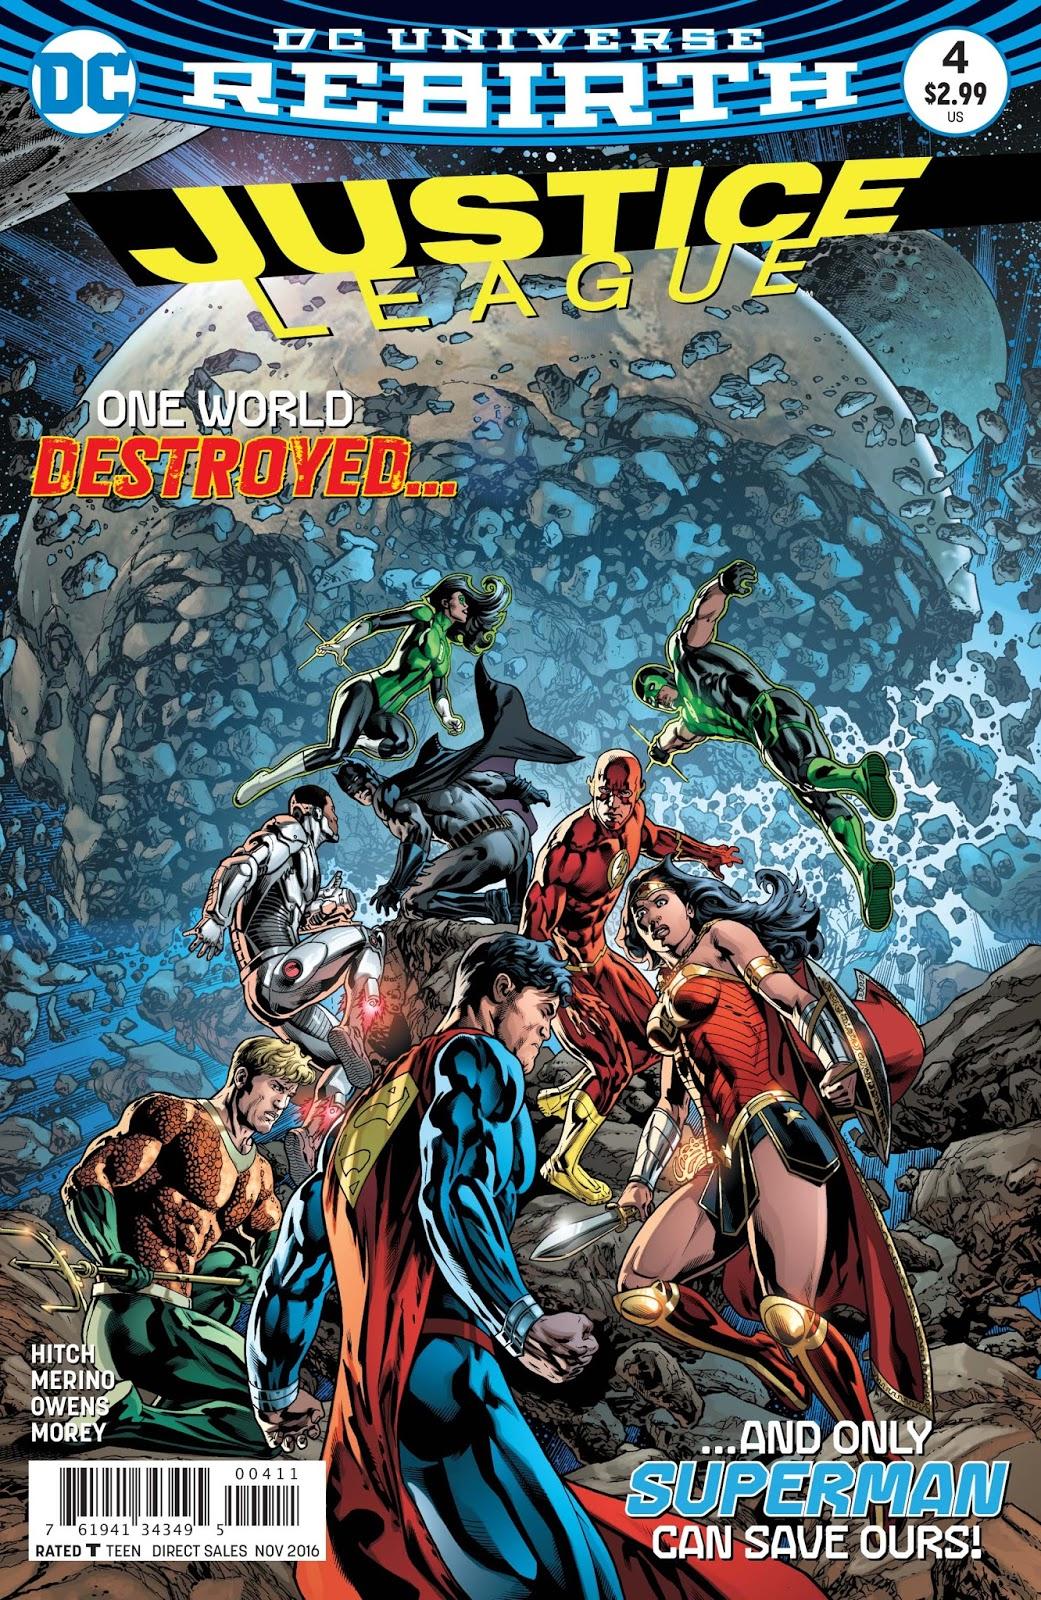 justice league review - photo #28